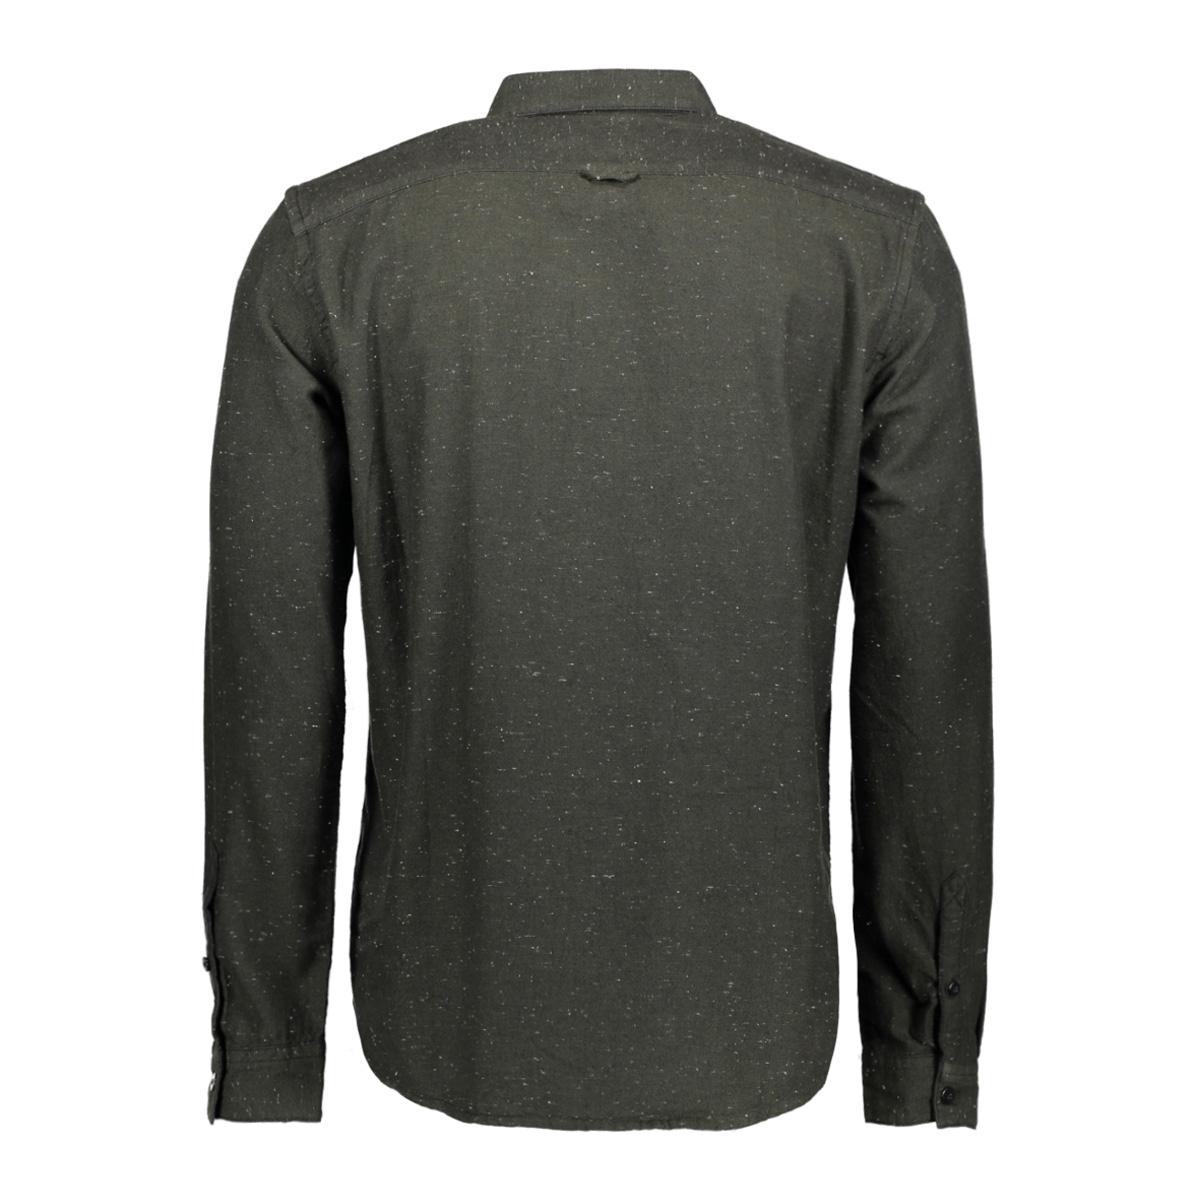 2055067.62.12 tom tailor overhemd 1000